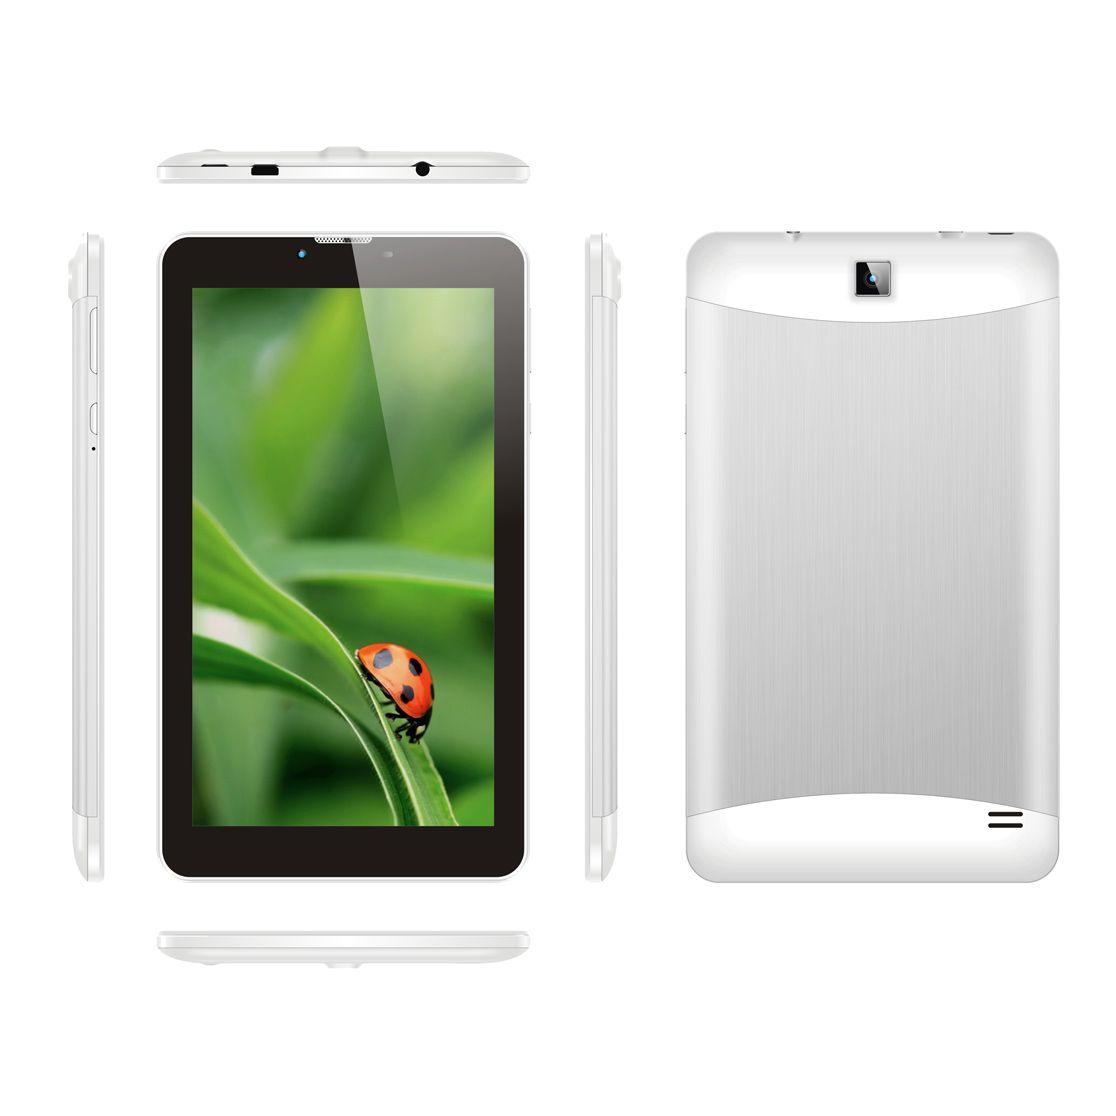 CAPIX 7inch 3G Intel SoFIA 3G-R Quad Core Tablet PC 64-bit